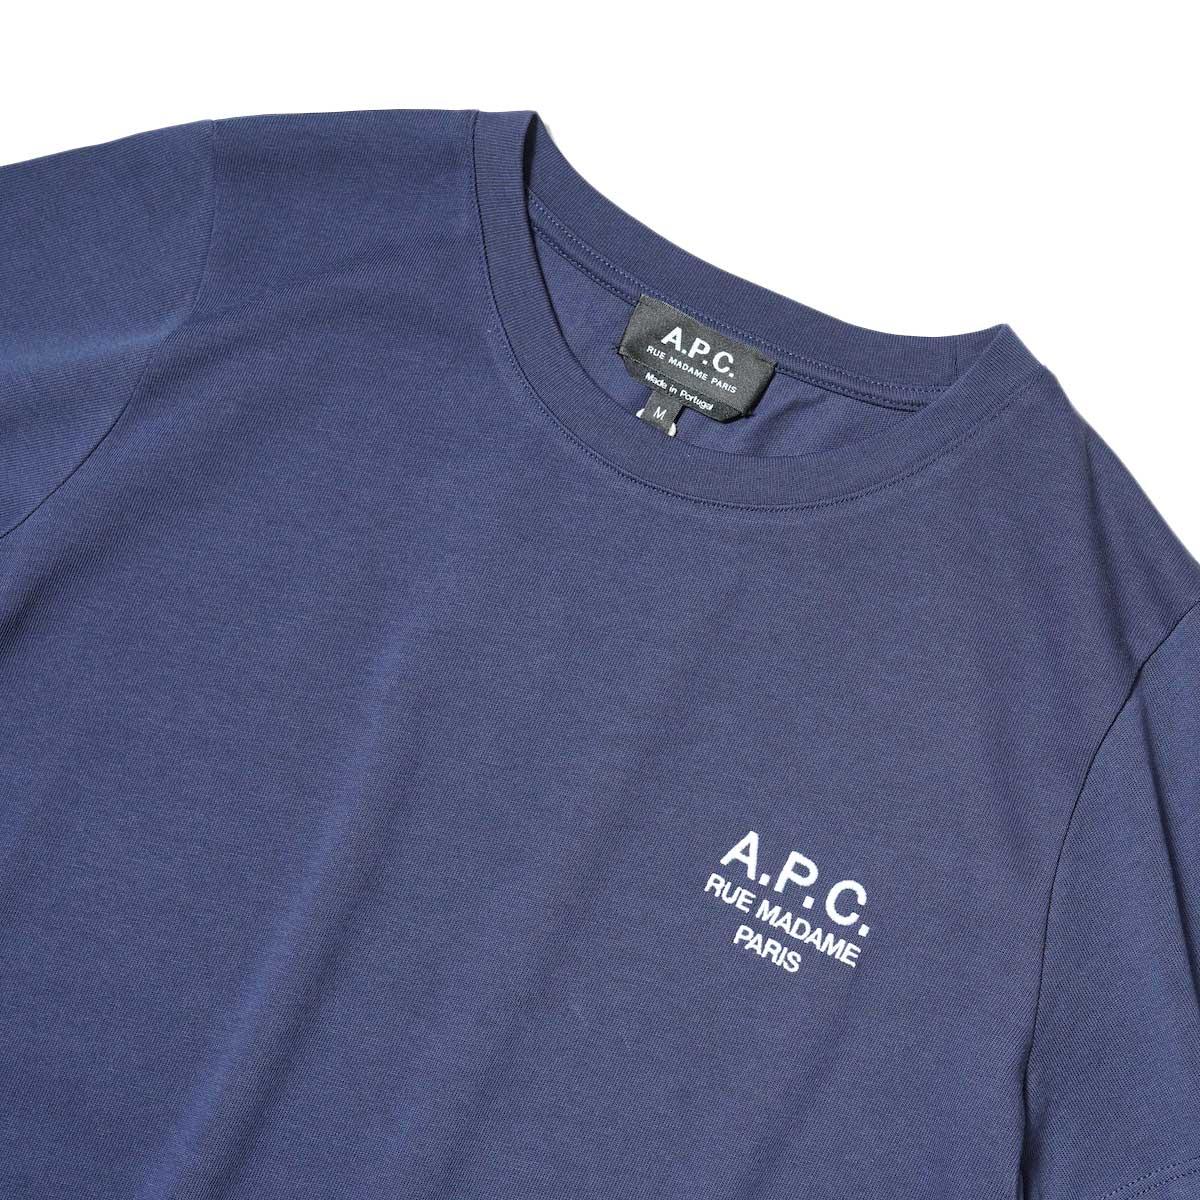 A.P.C. / Denise Tシャツ (Navy) フロント・刺繍